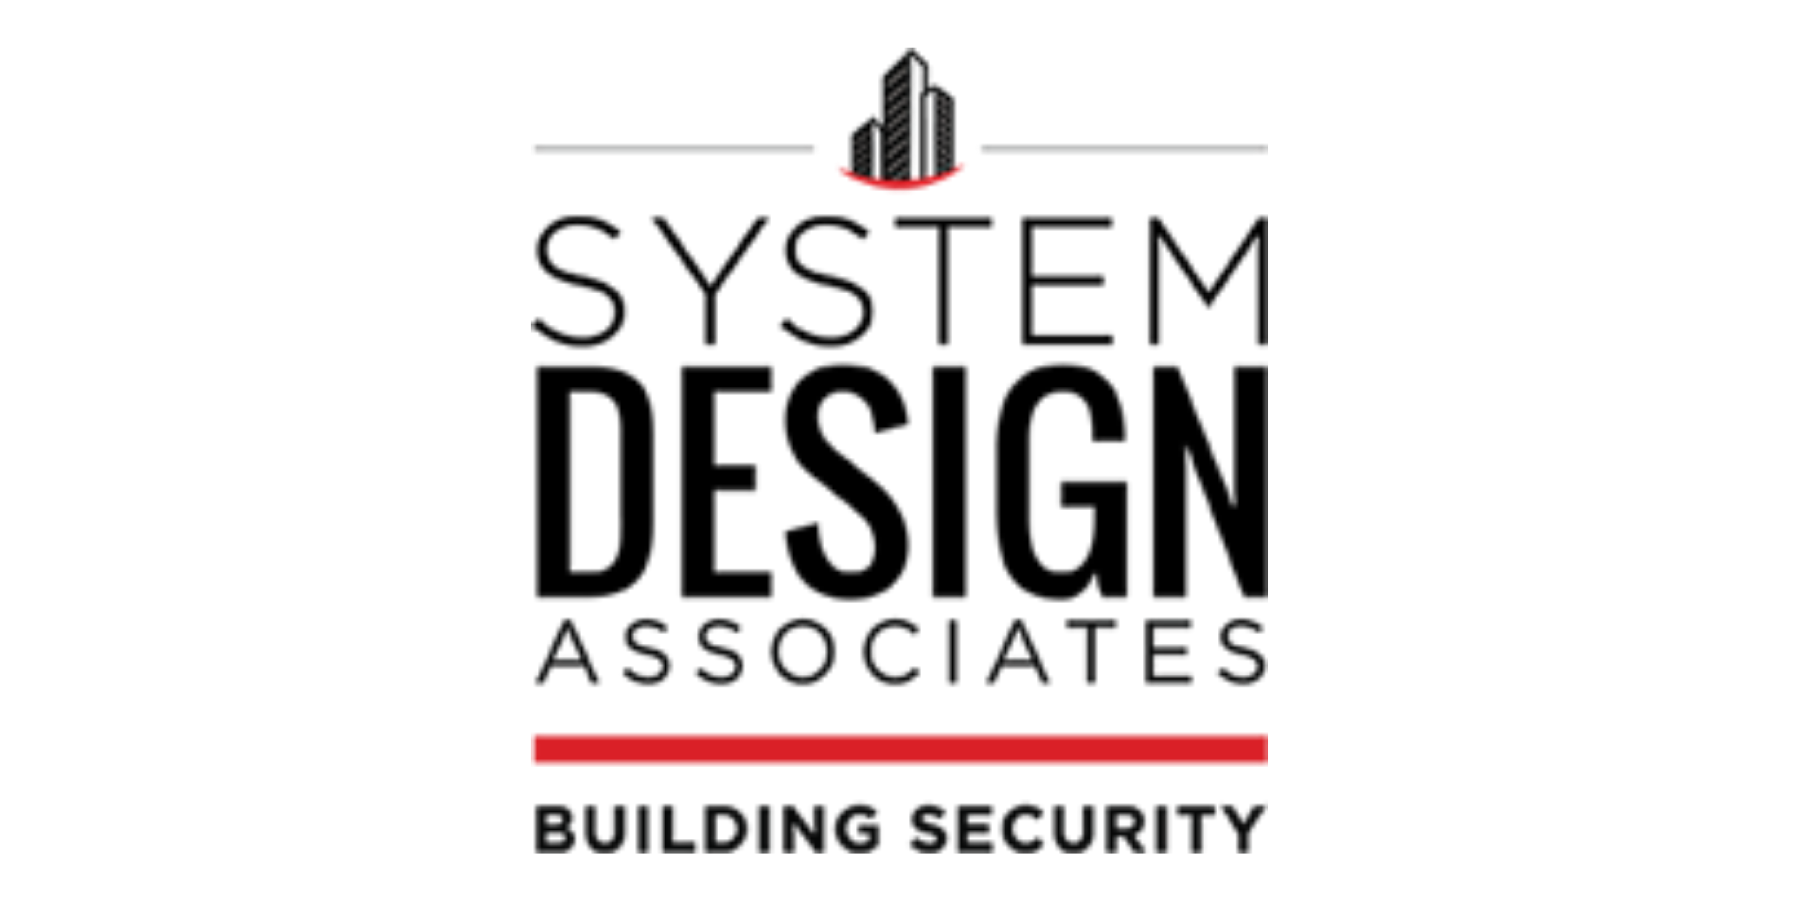 System Design Associates